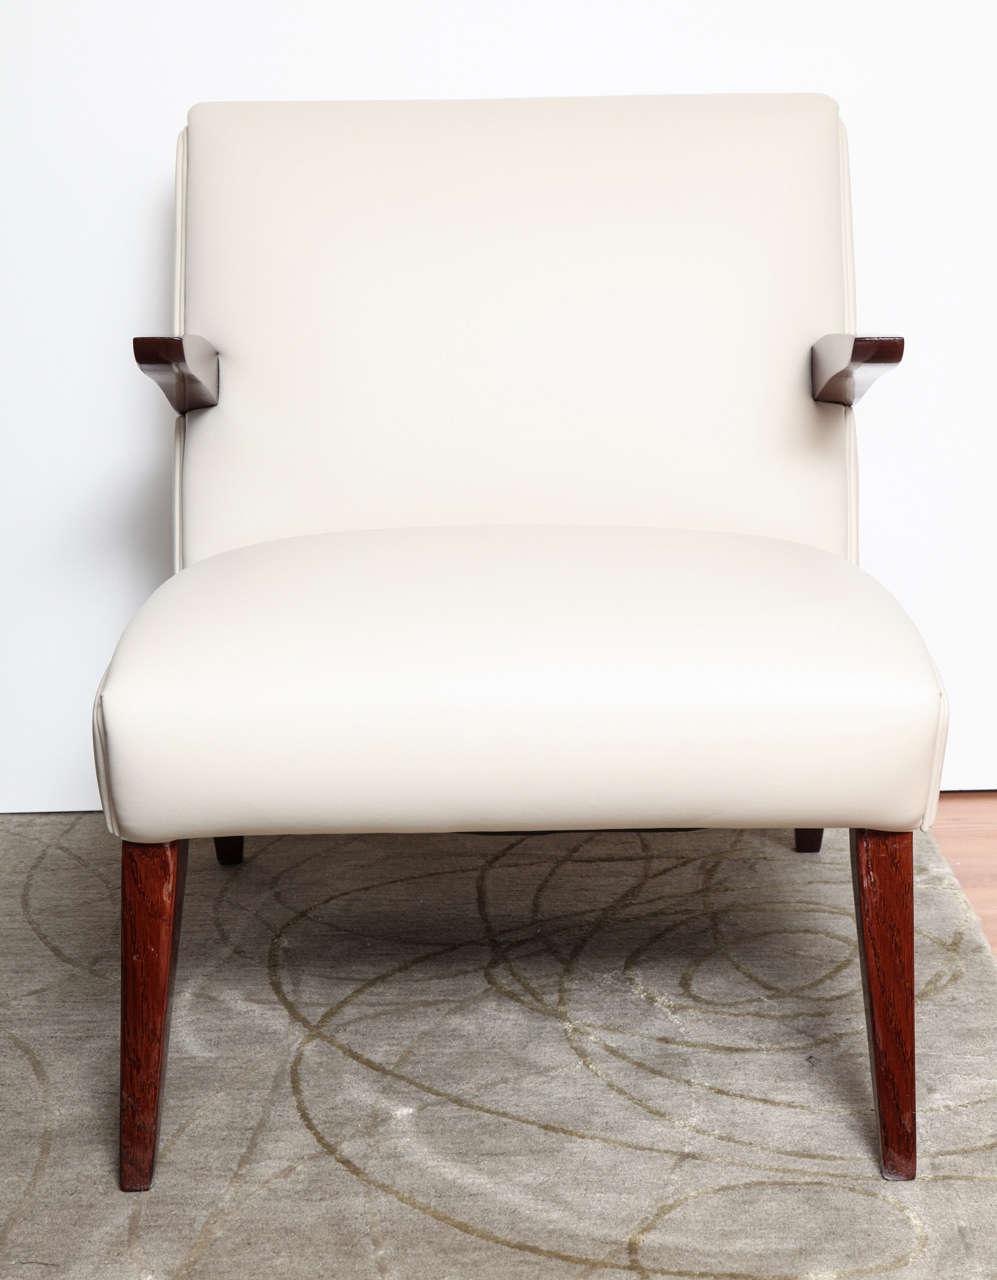 Pair of Art Deco Streamline Lounge Chairs 7